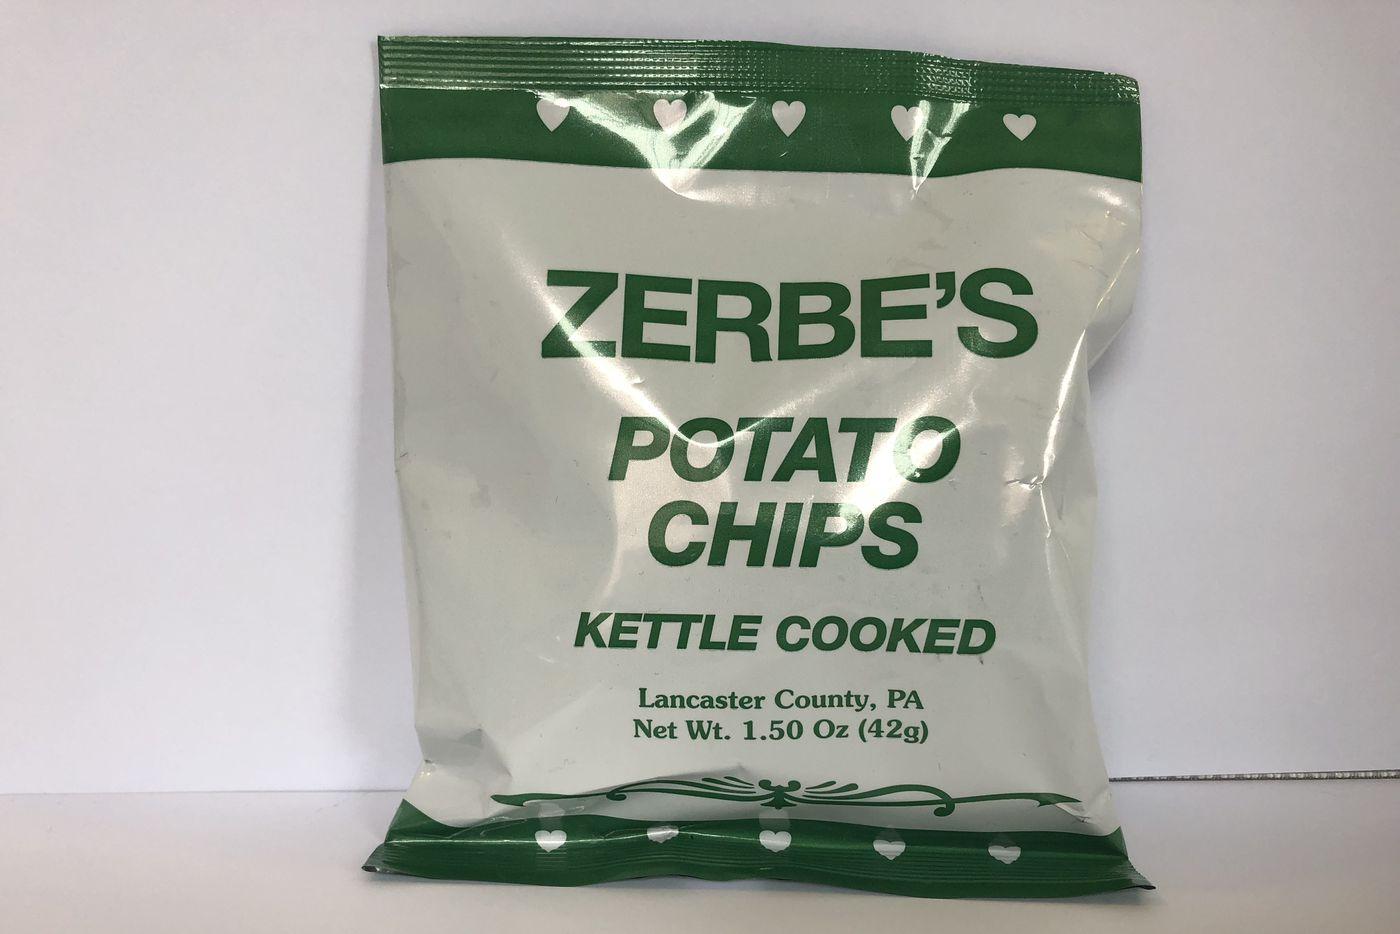 Farm-fresh potato chips from Lancaster County